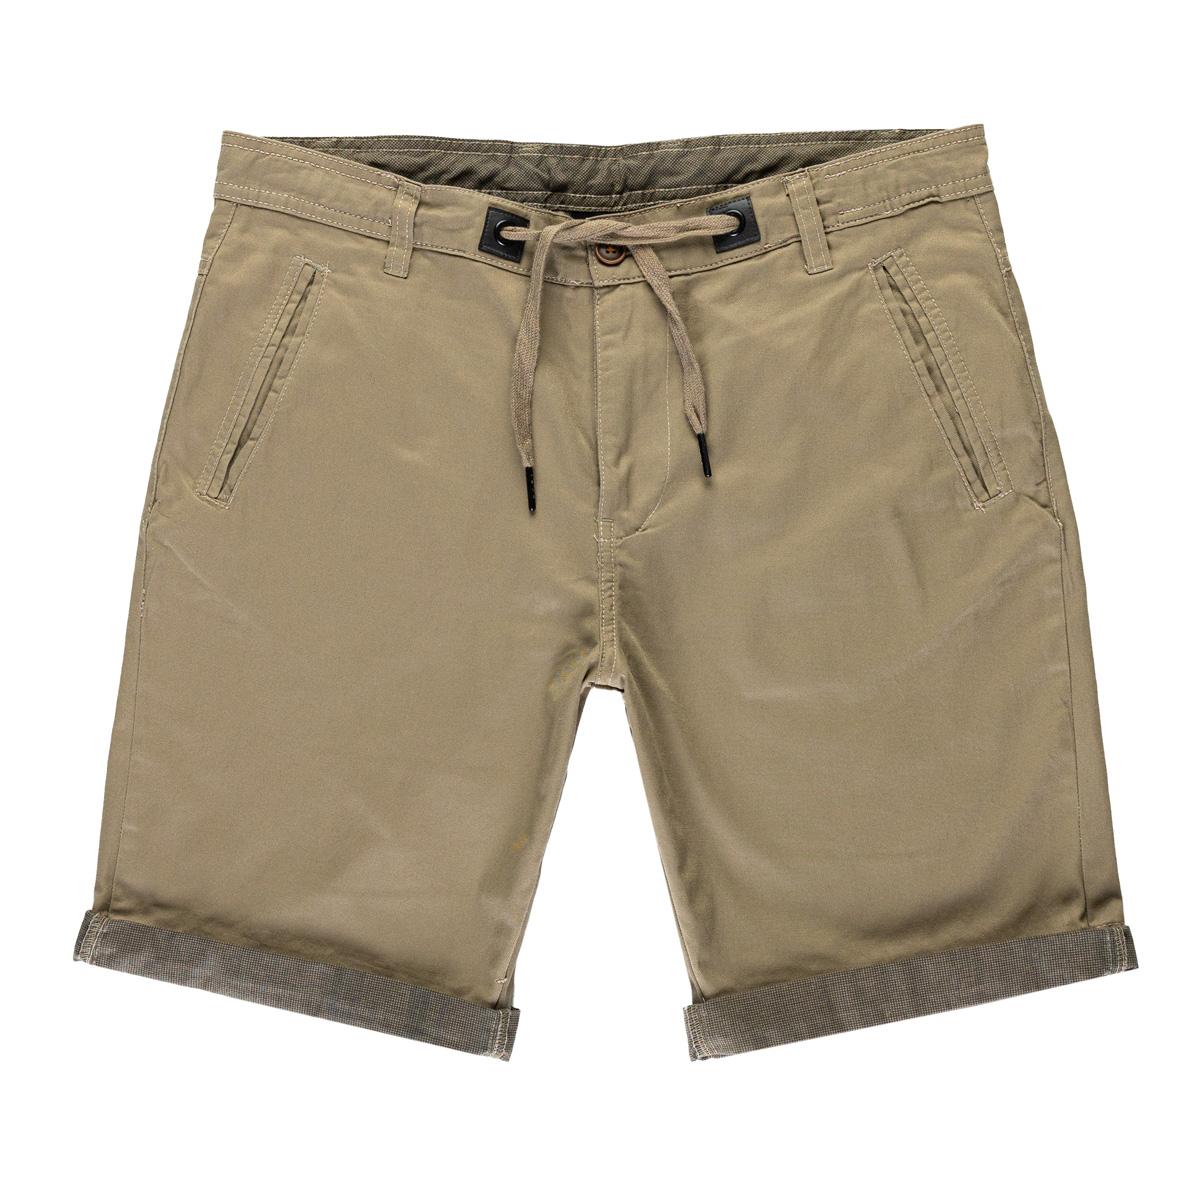 Moške hlače, bež